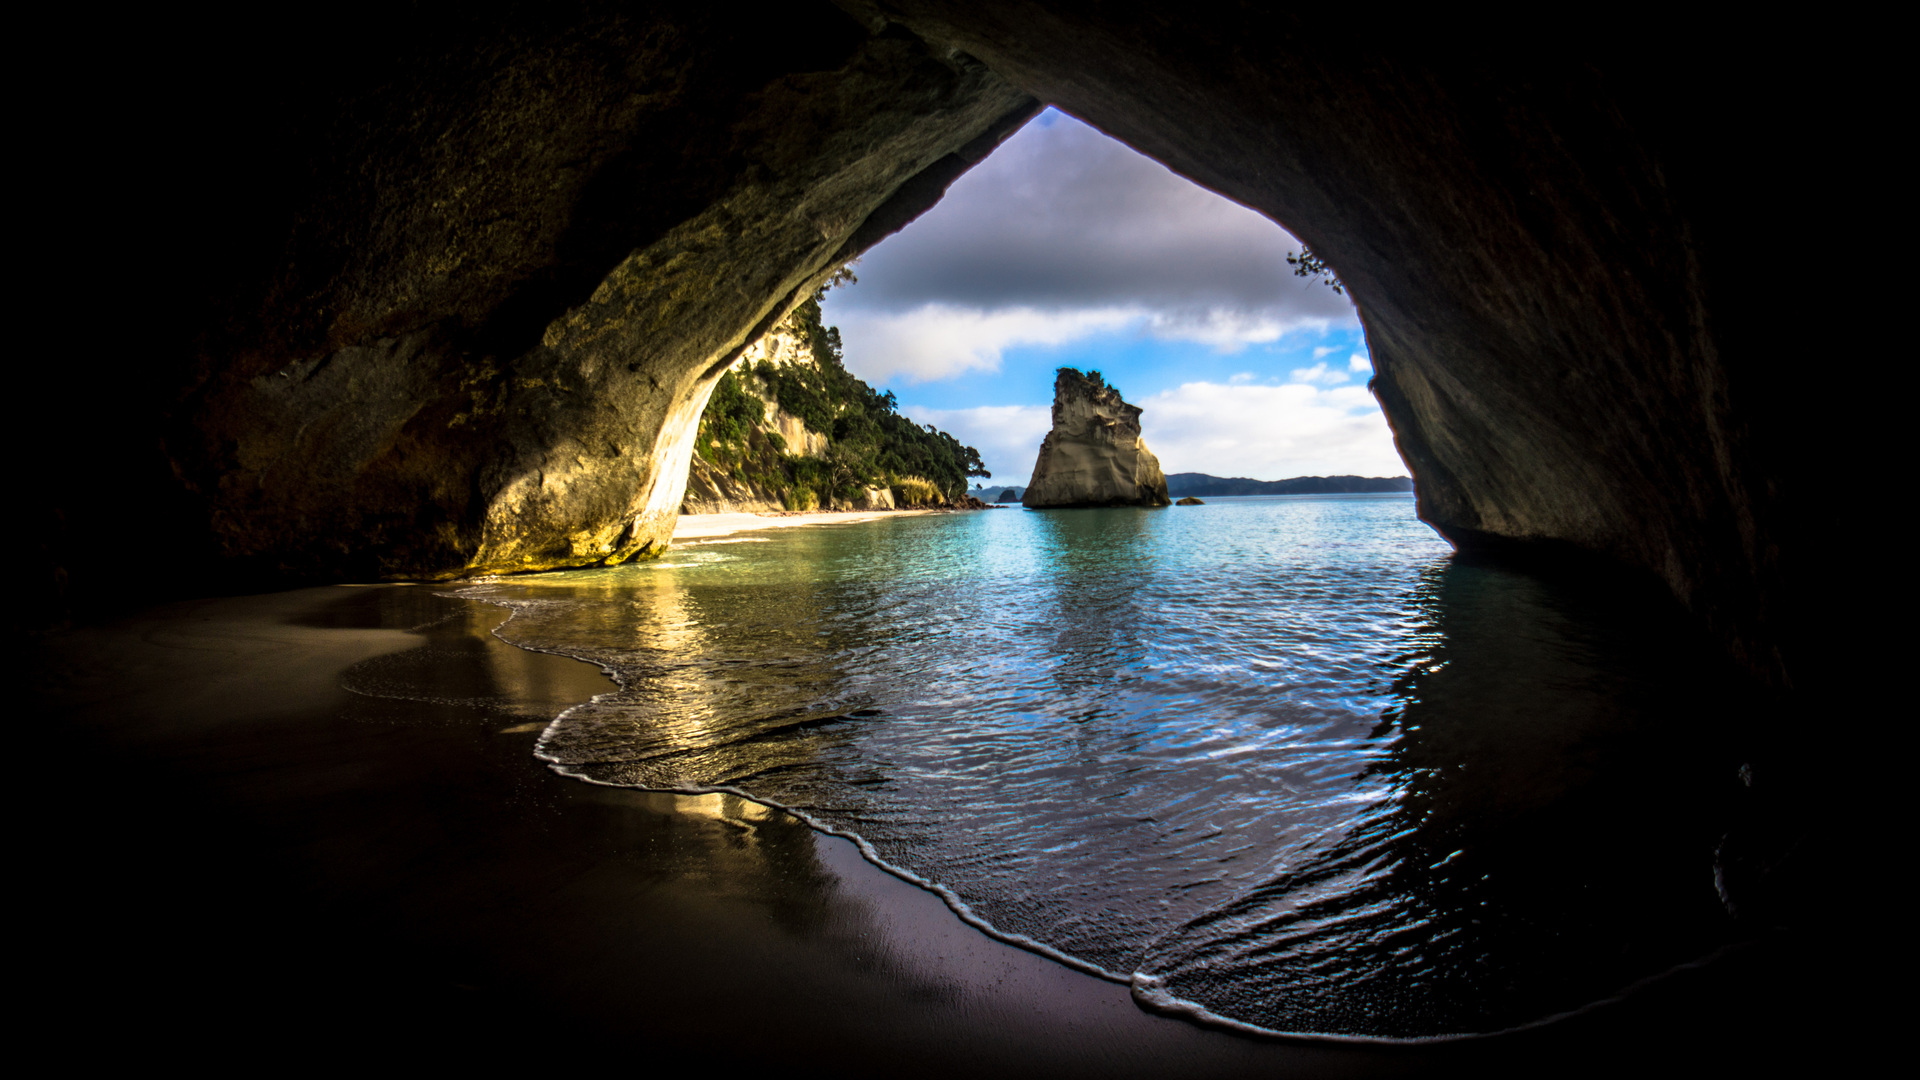 1920x1080 Cave On The Ocean Laptop Full HD 1080P HD 4k ...